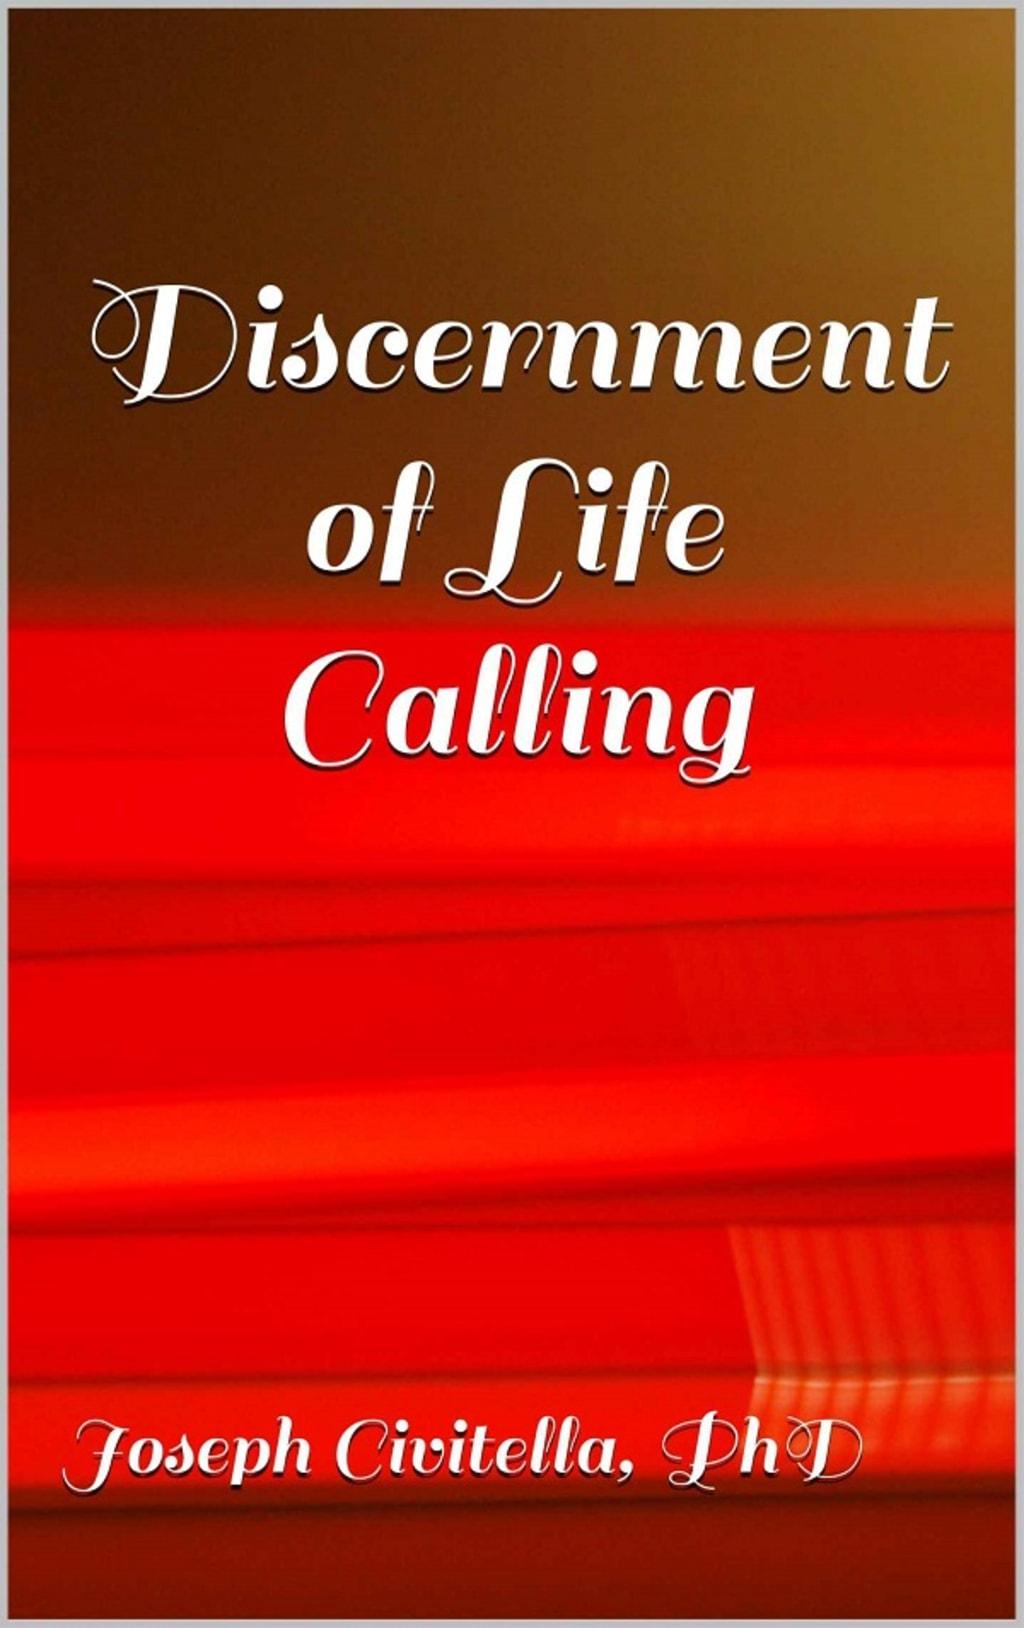 Discernment of Life Calling Excerpt 3